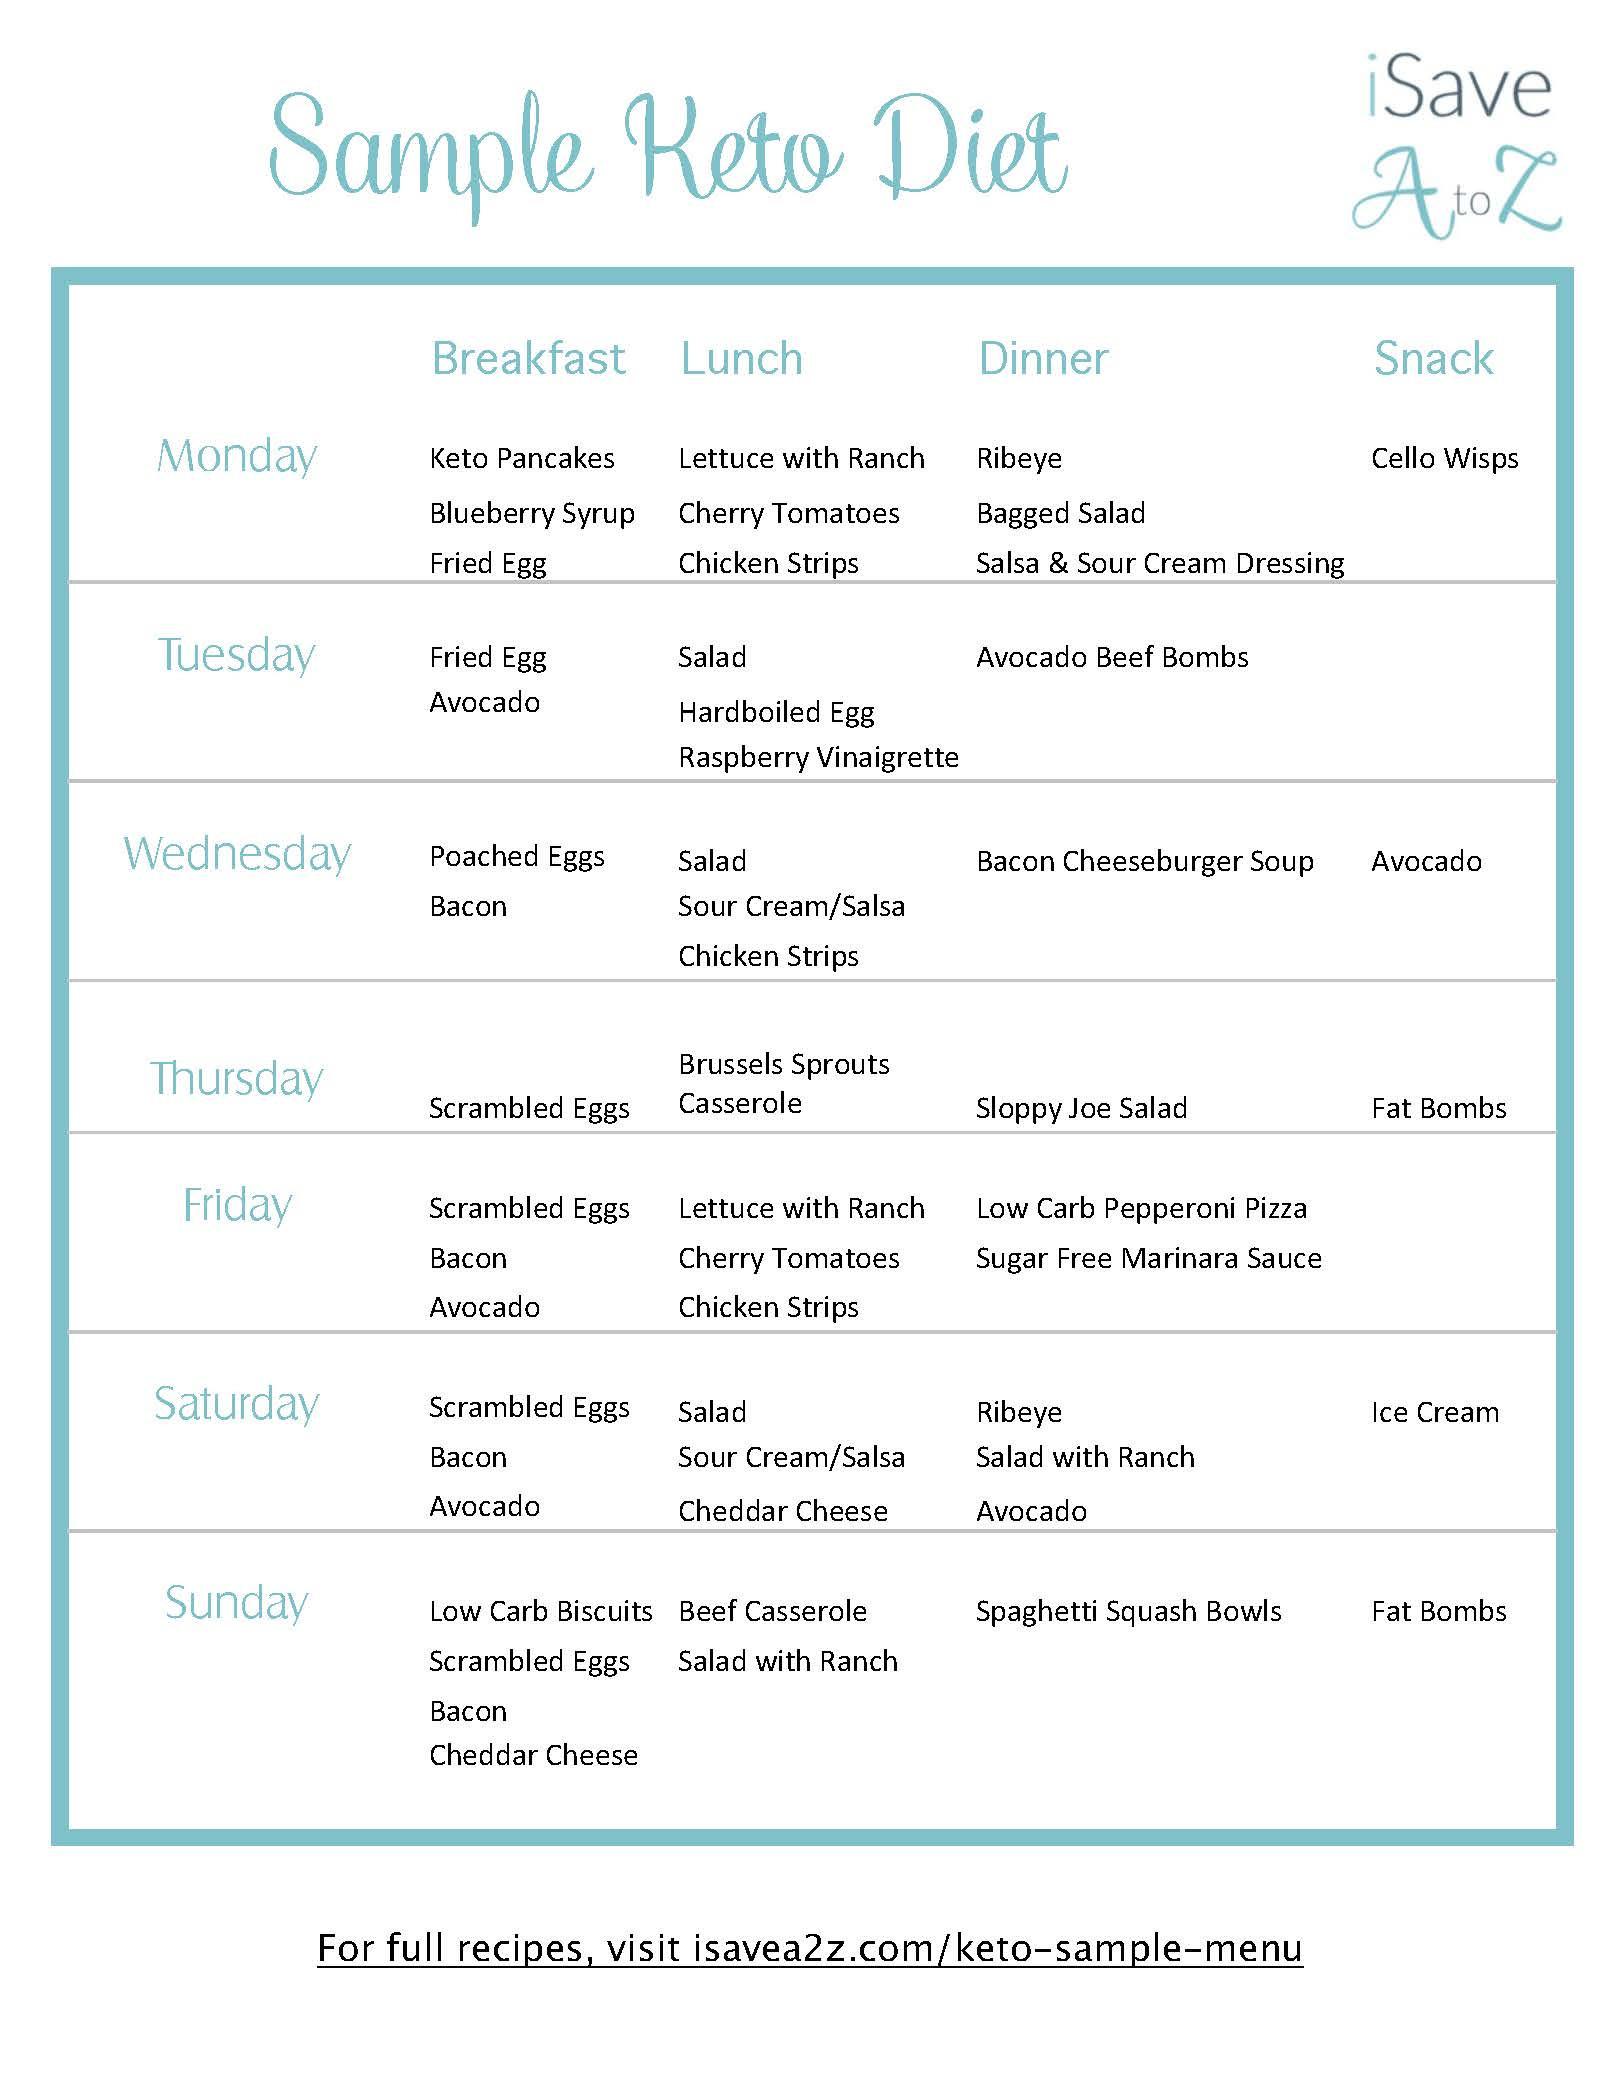 Keto Diet Meal Plan Examples  Keto Sample Menu 7 Day Plan iSaveA2Z